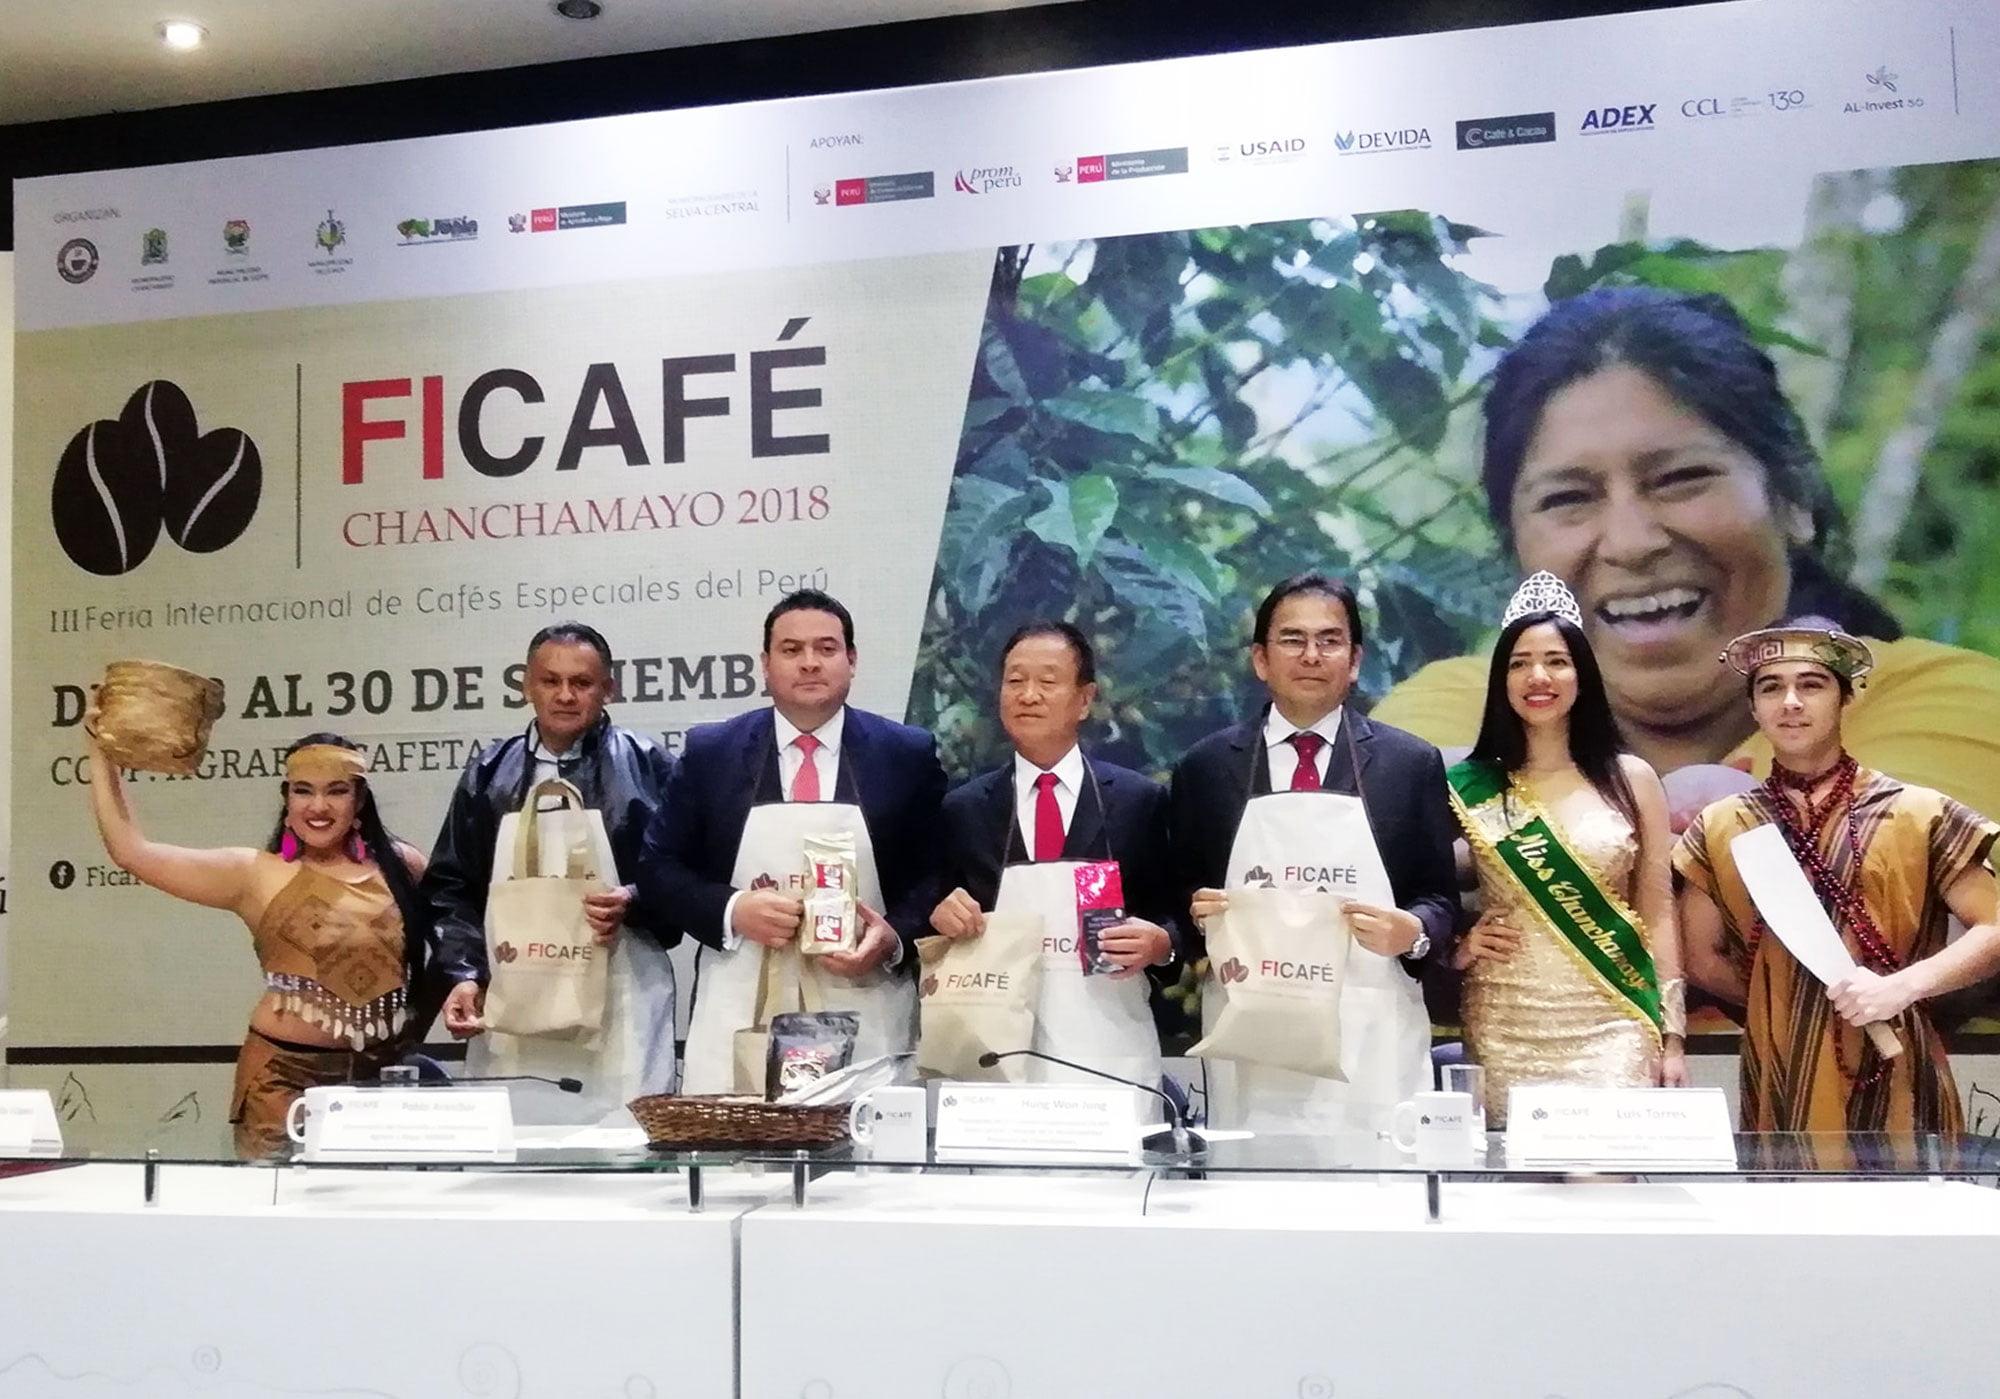 FICAFÉ 2018: Feria Internacional en Chanchamayo